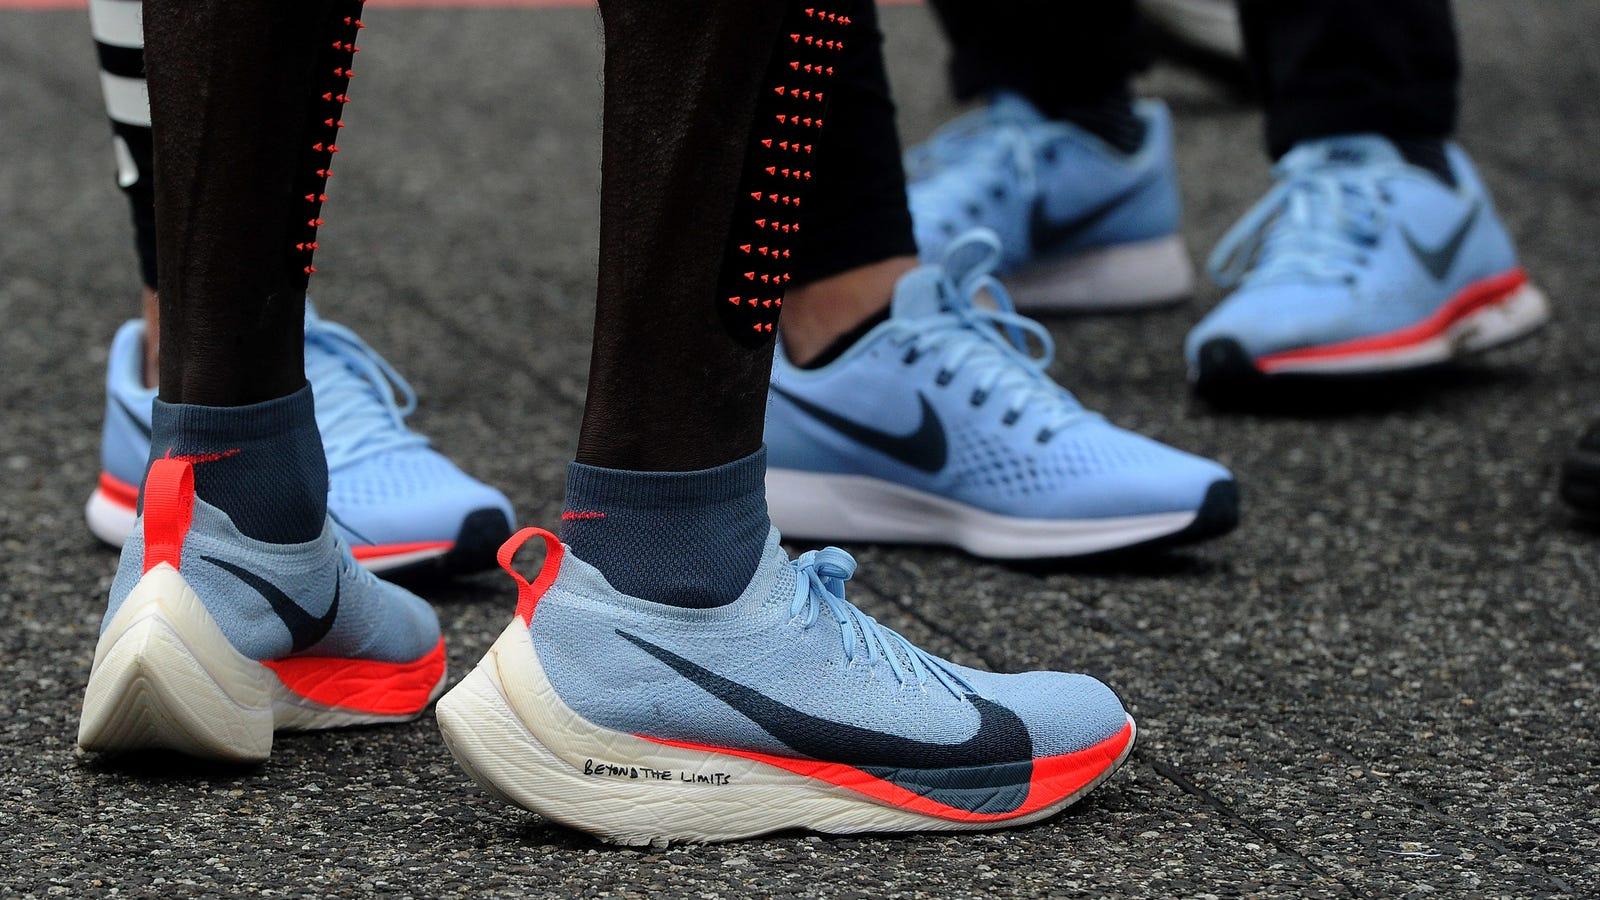 Do Running Shoes Make You Run Faster